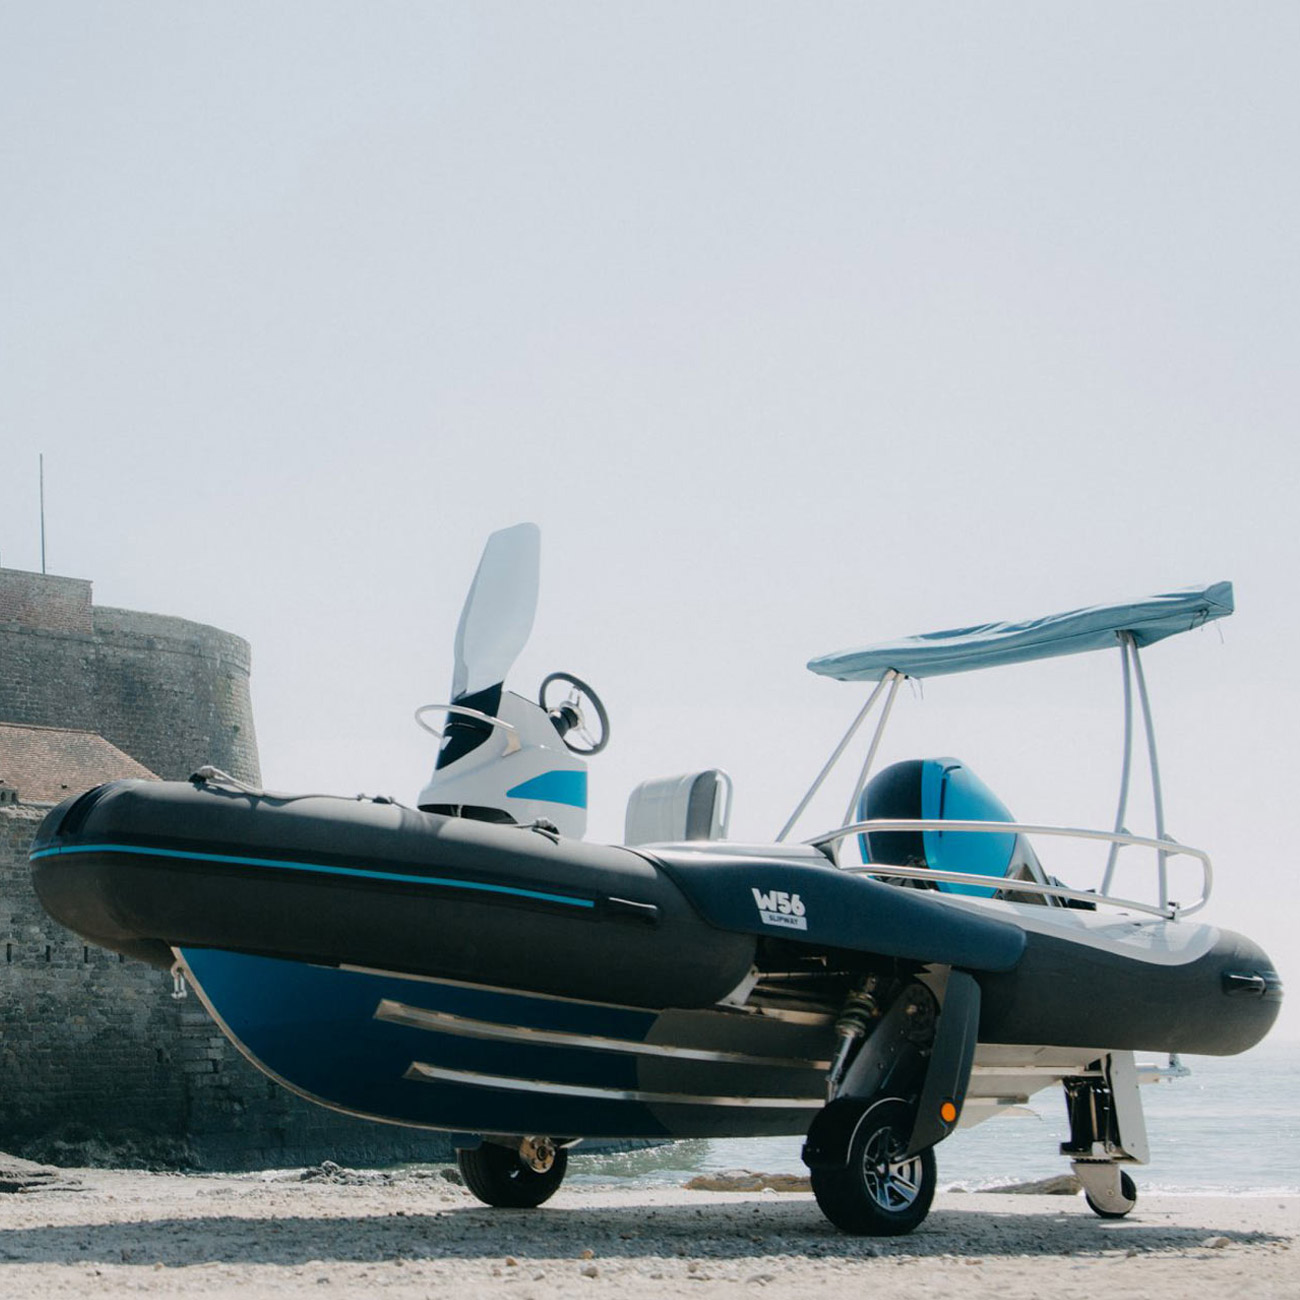 Wetton56-bateau-amphibie-Vincent-Lebailly-semi-rigide